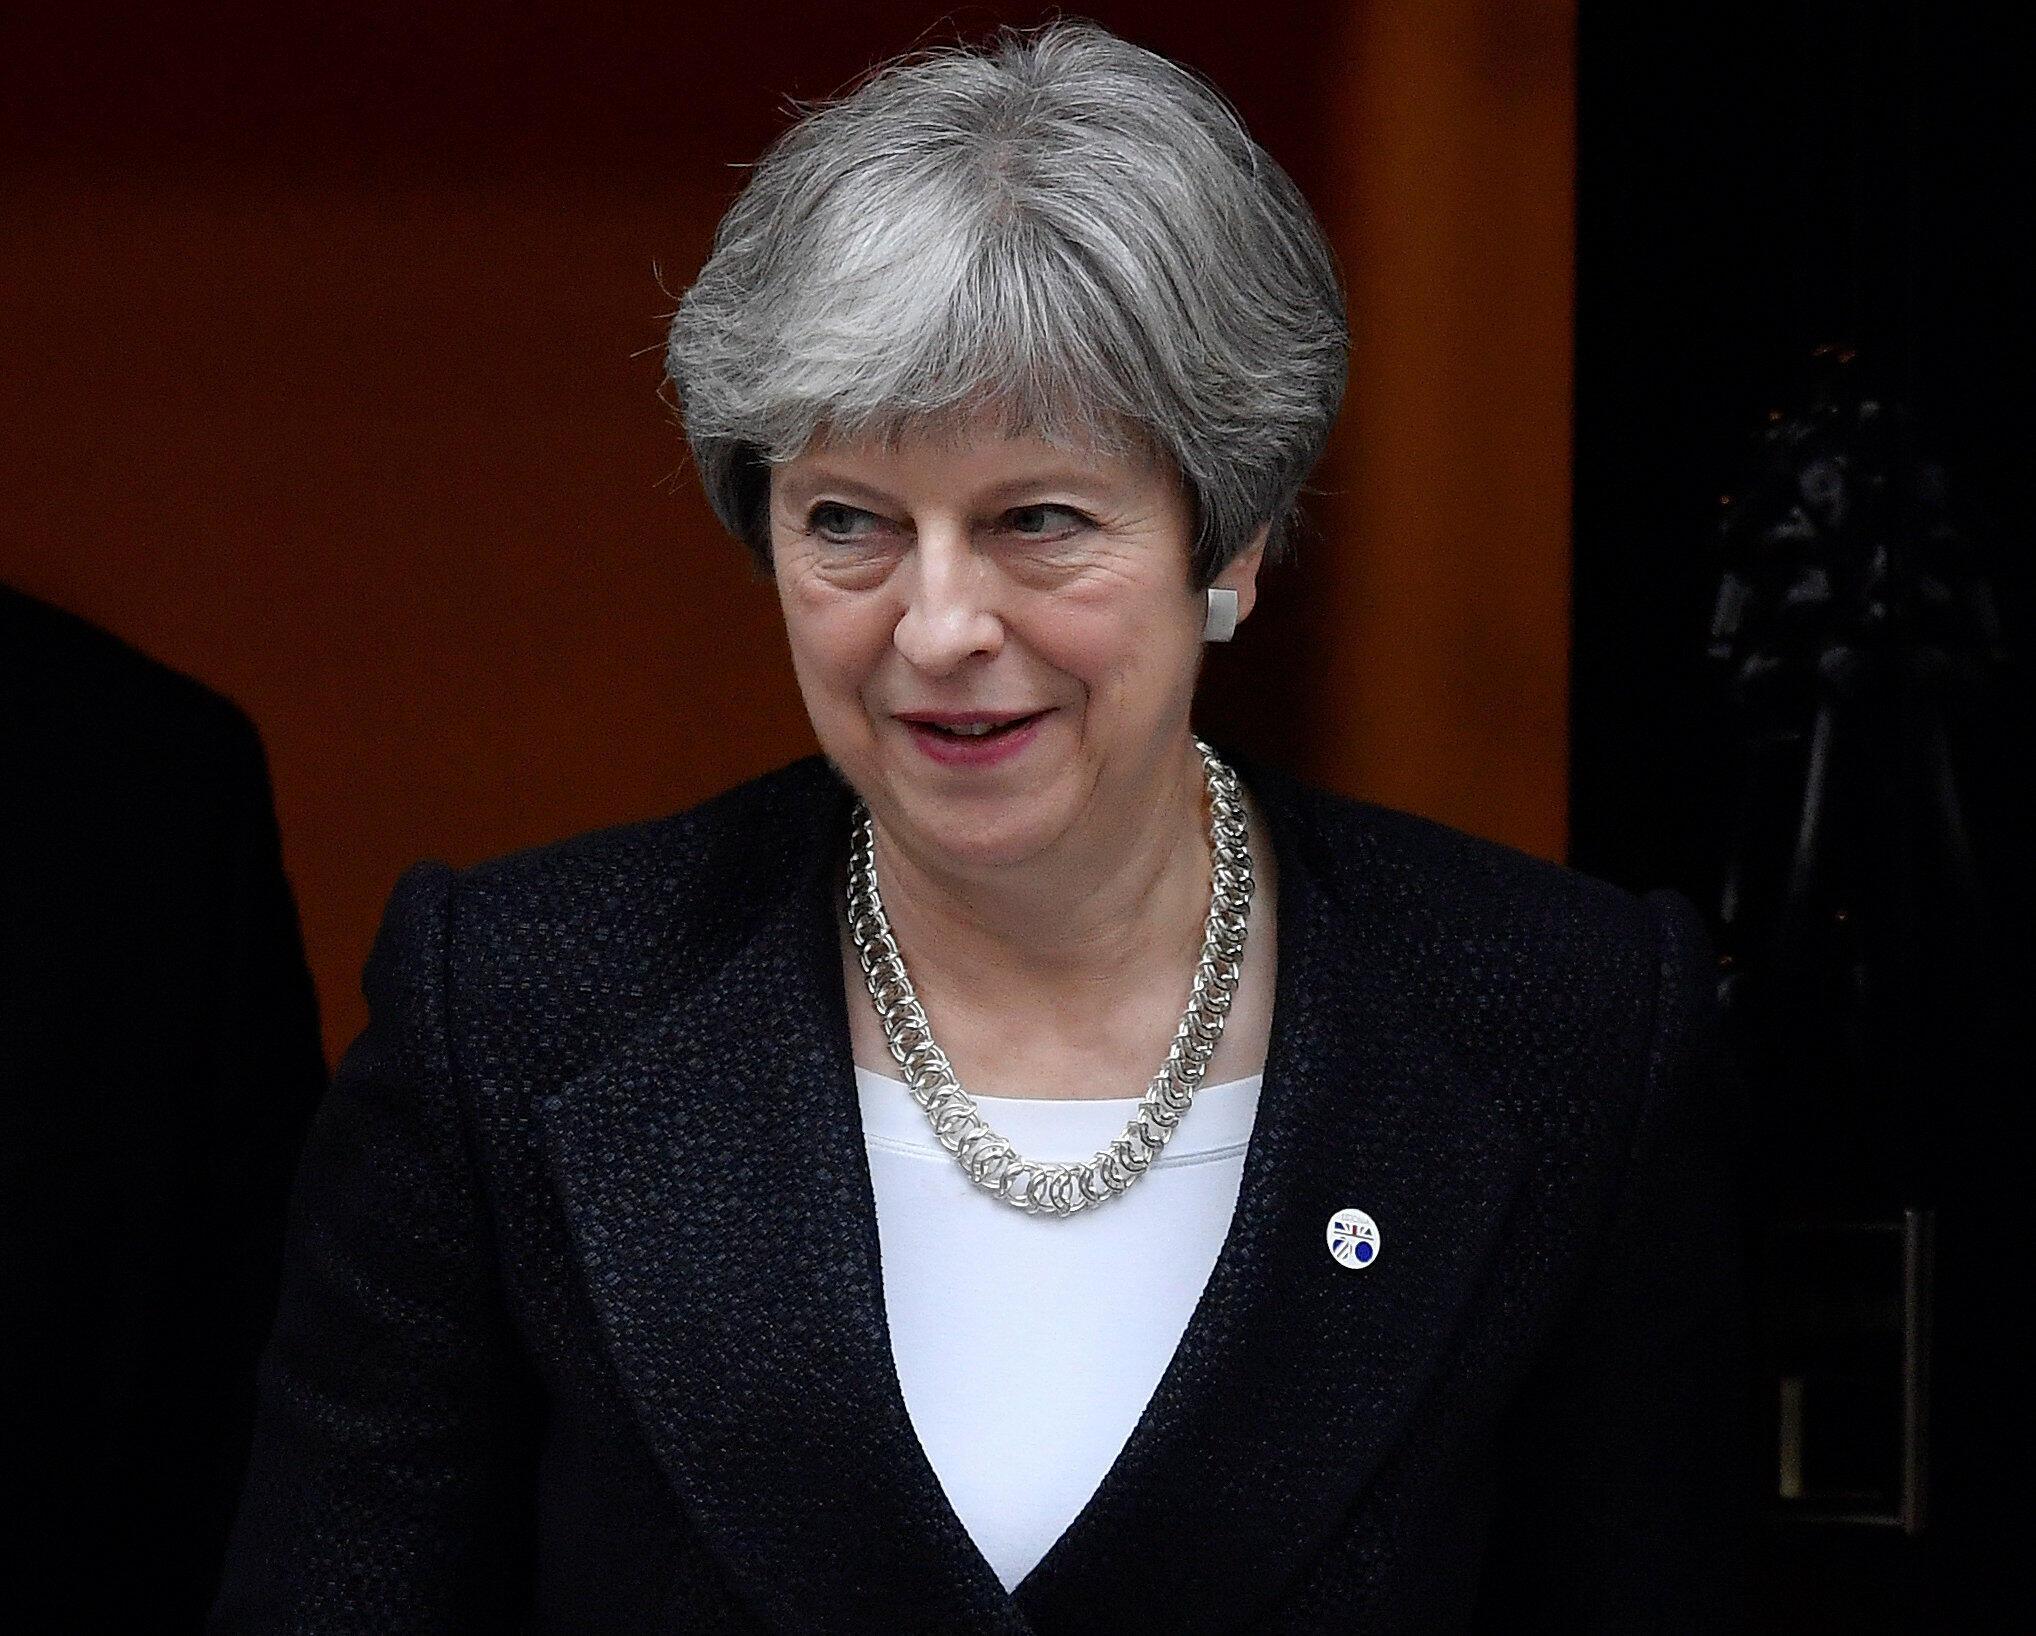 Firaministan Burtaniya Theresa May